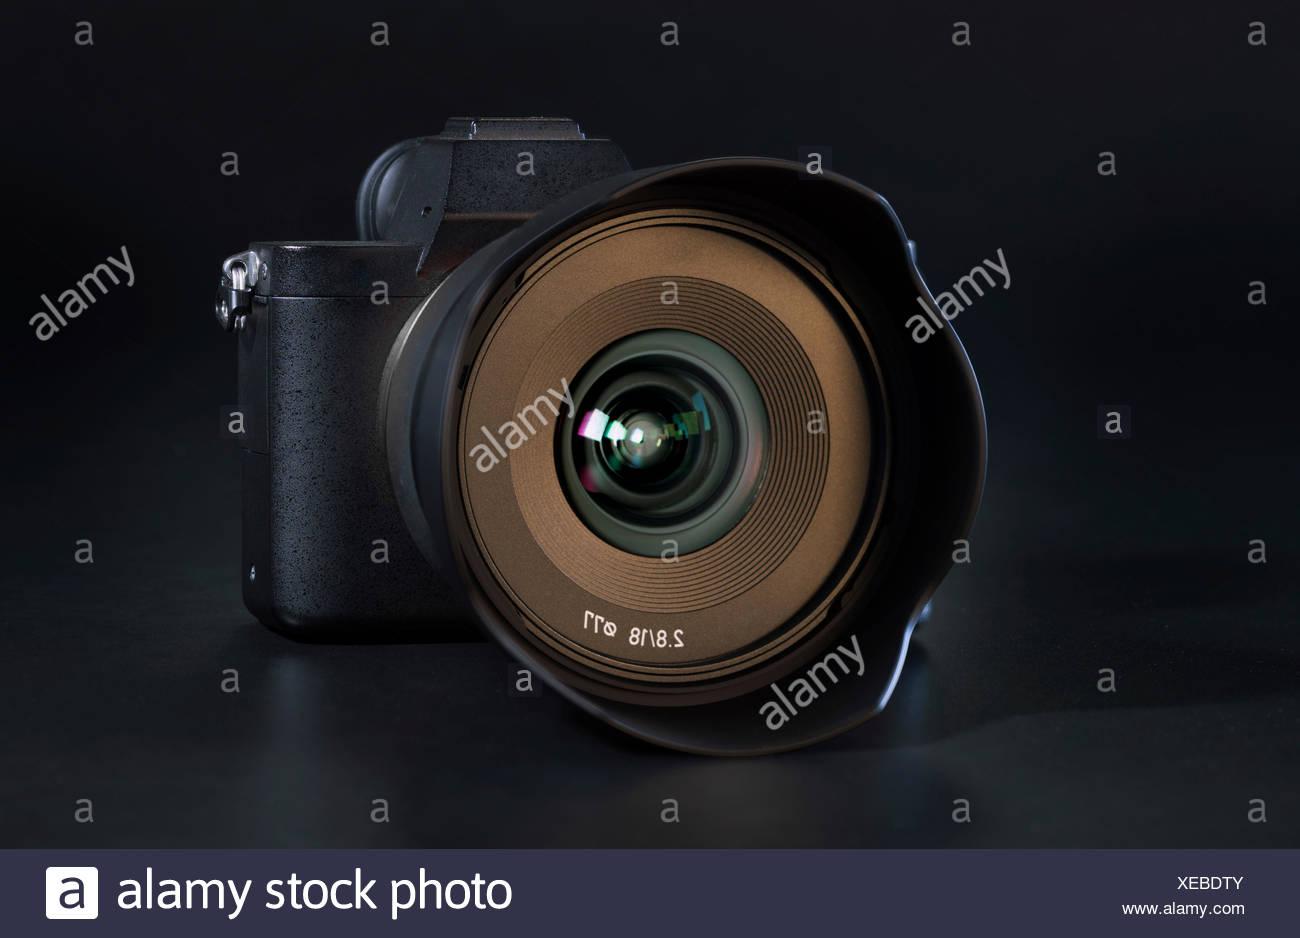 Digital camera lens. - Stock Image